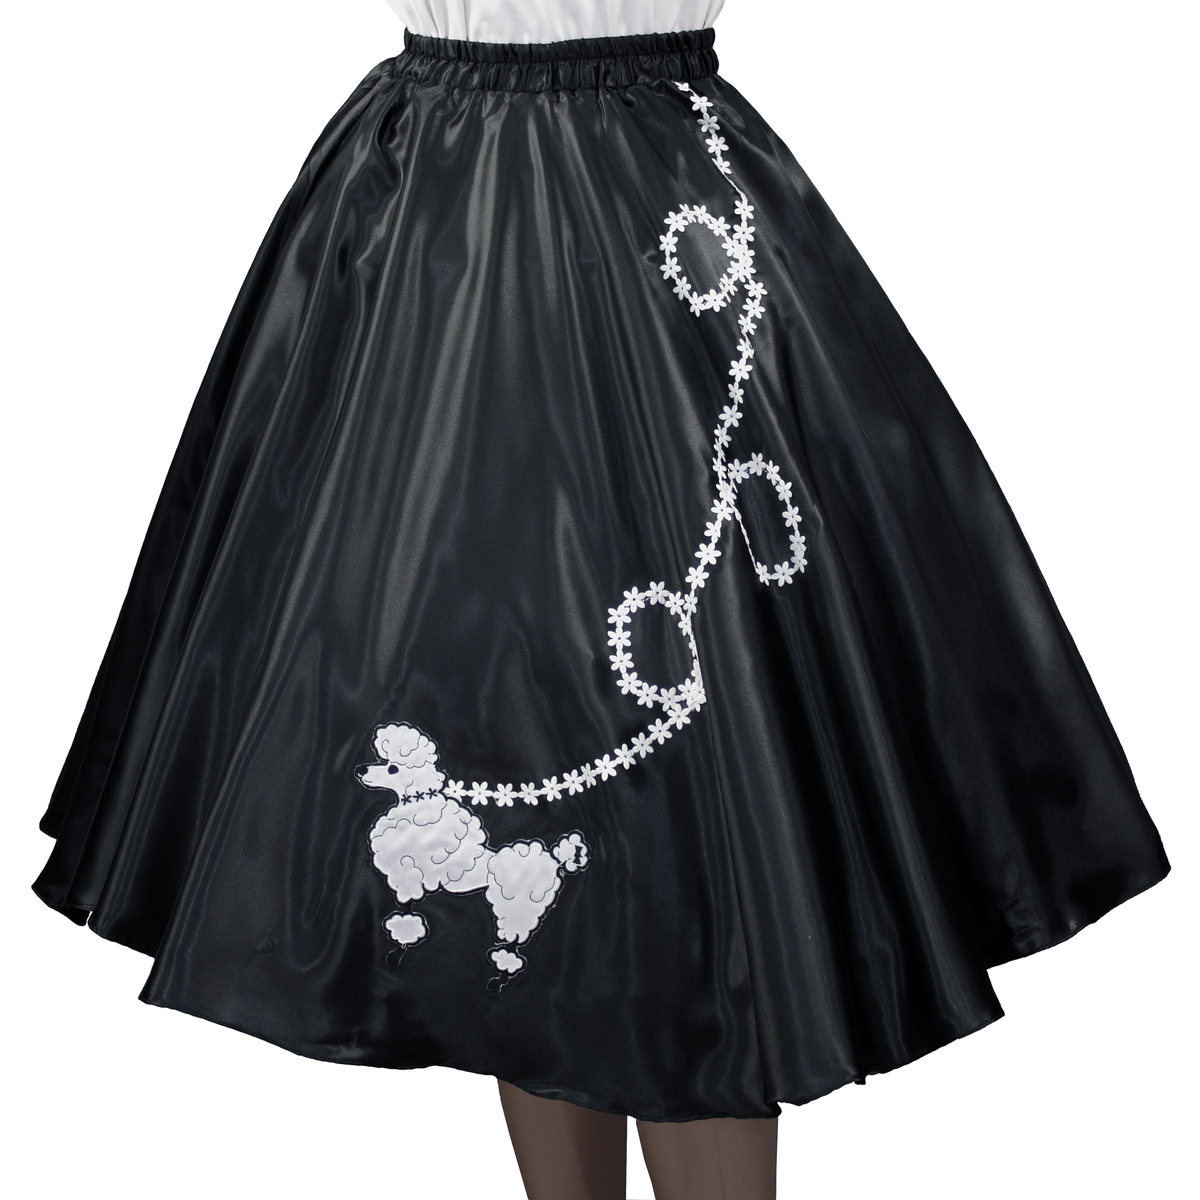 "Black SATIN 50/'s POODLE SKIRT Size X-Large  Waist 40/""-48/"" Length 25/"""